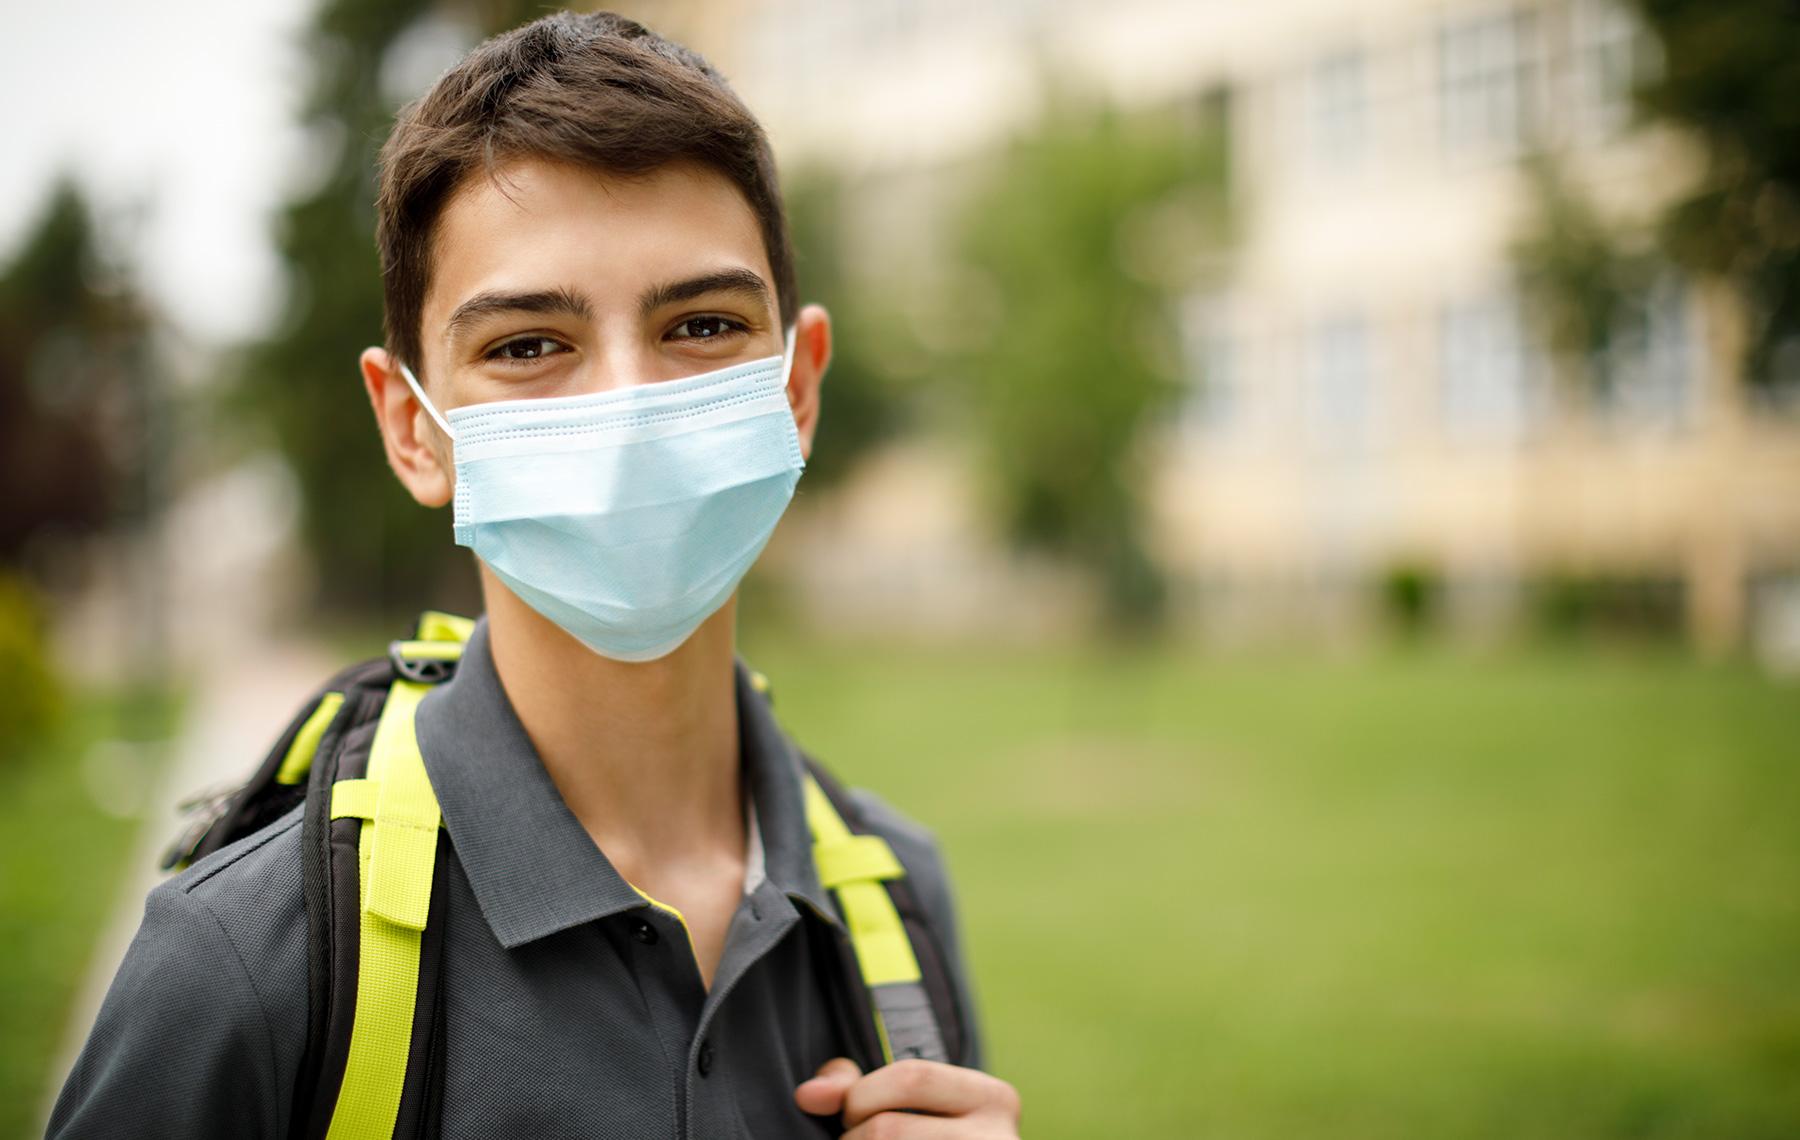 Boy with mask adolescen